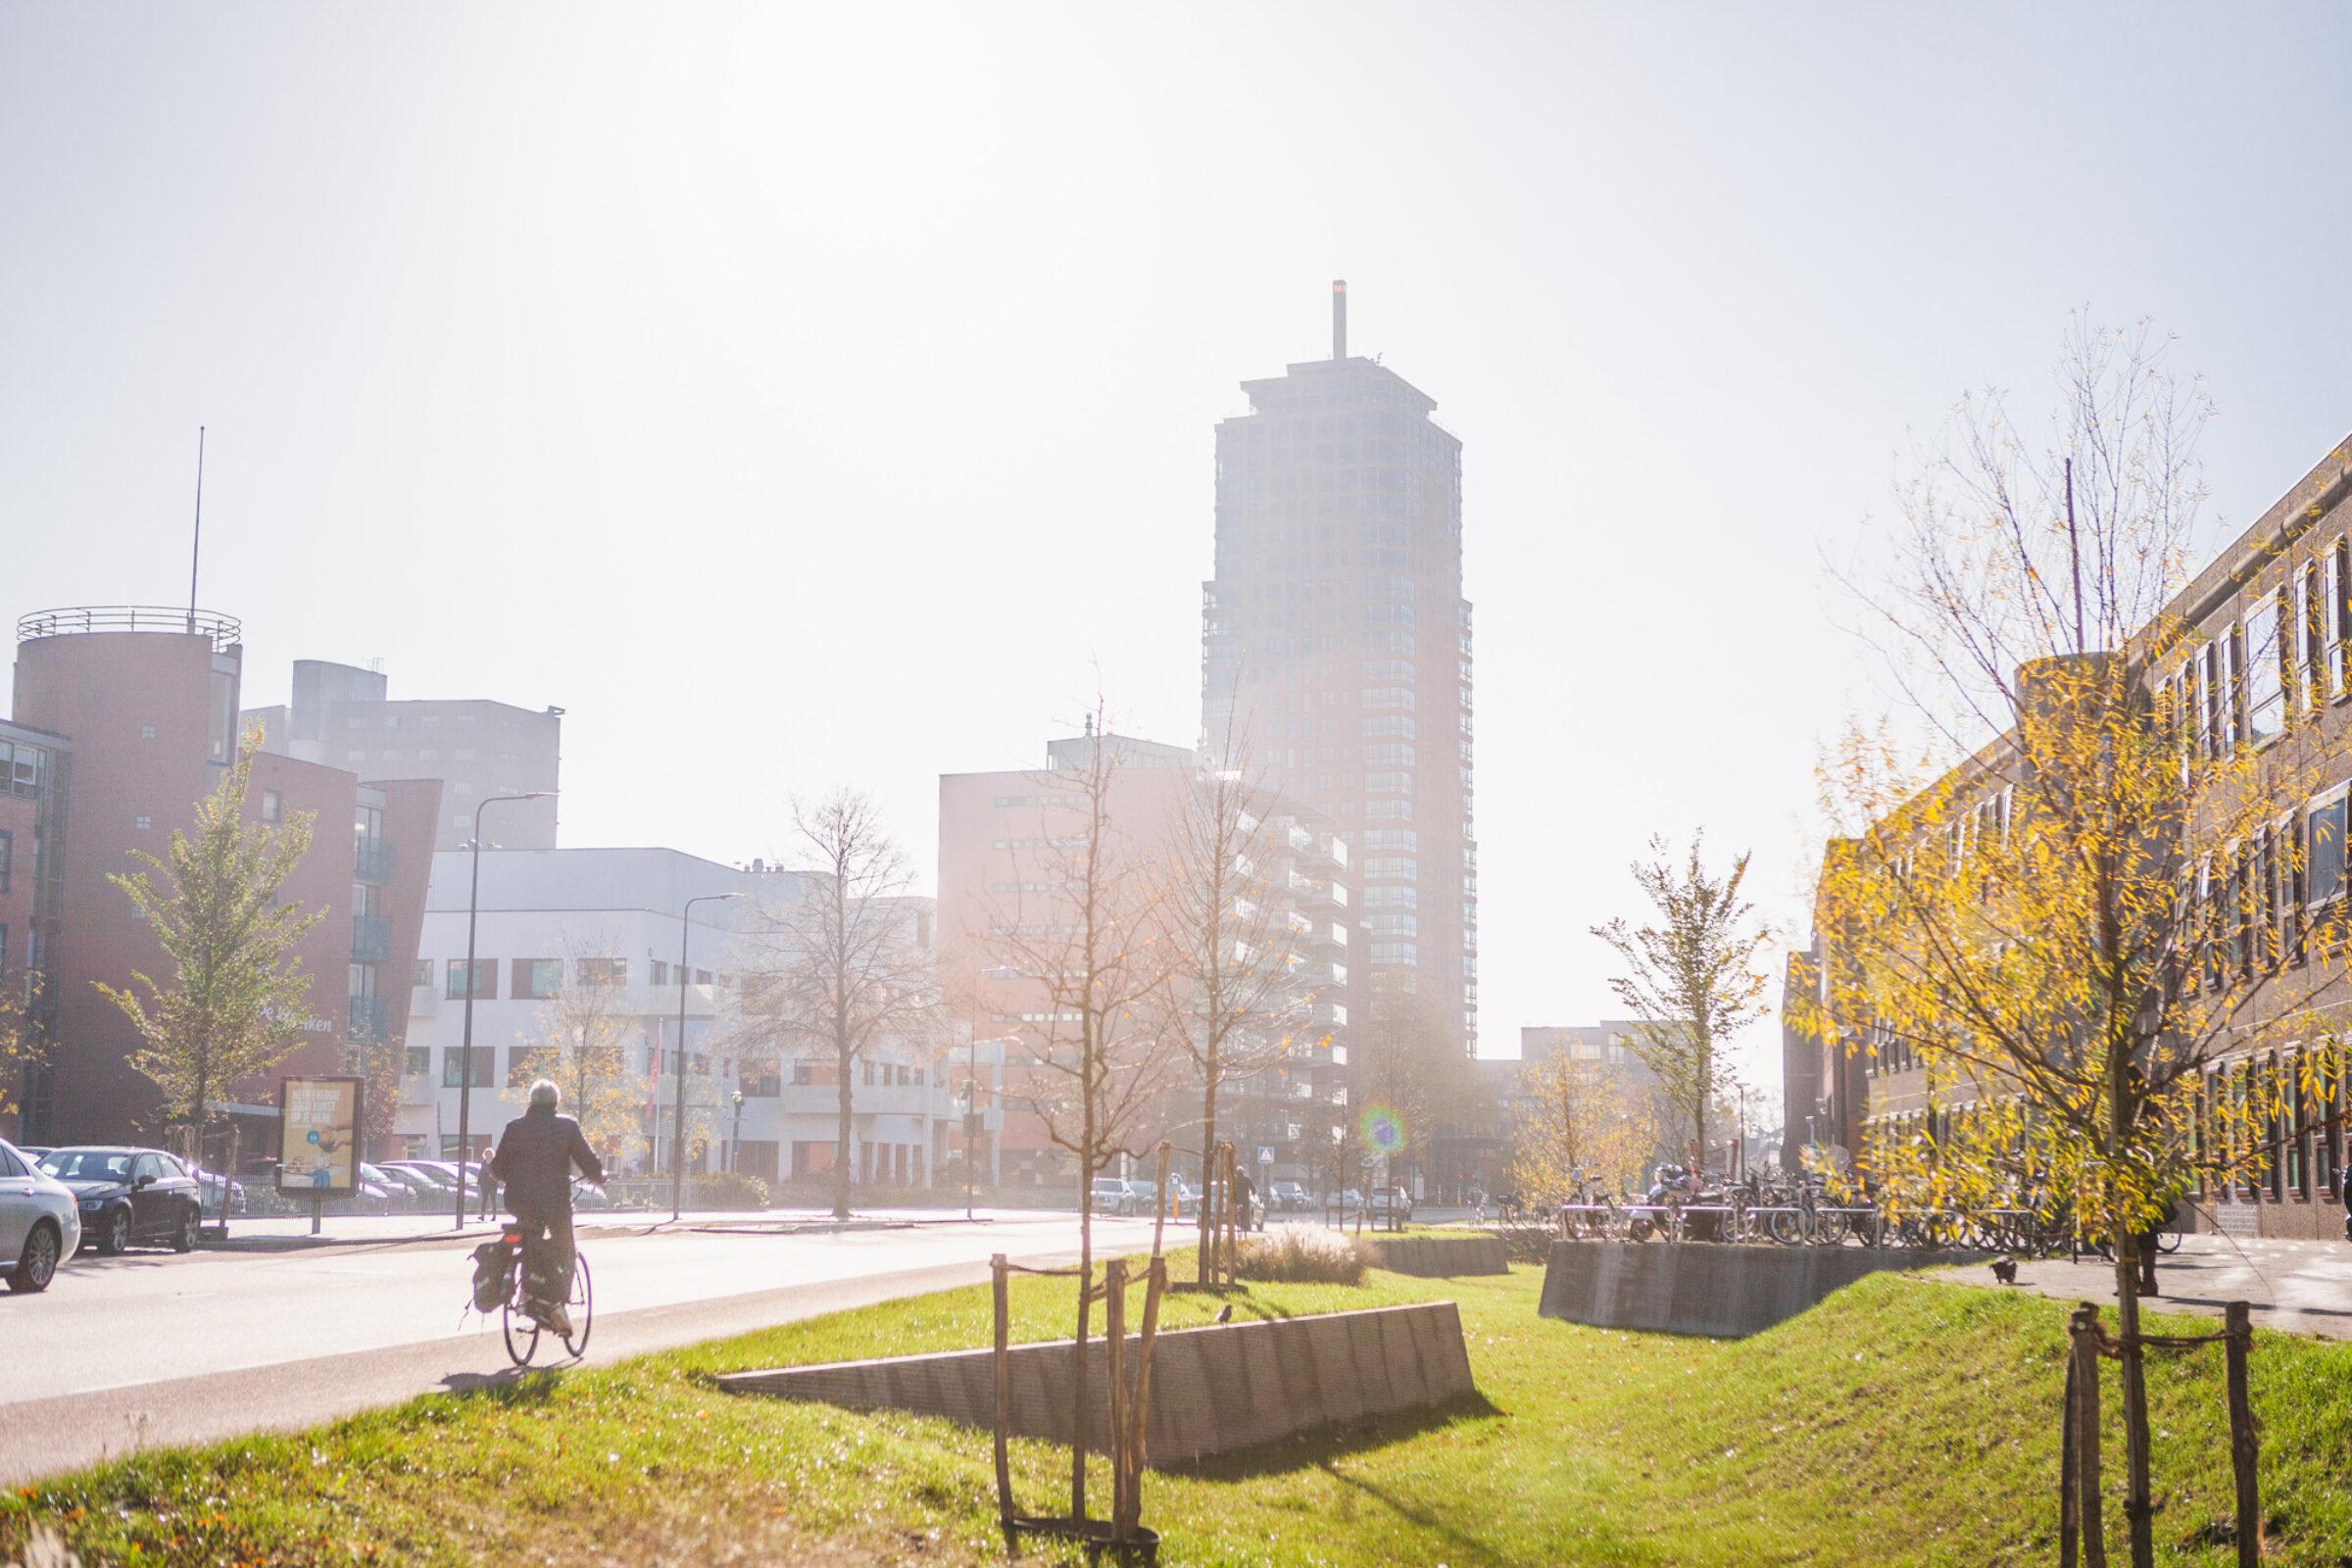 Enschede Herfst Centrum